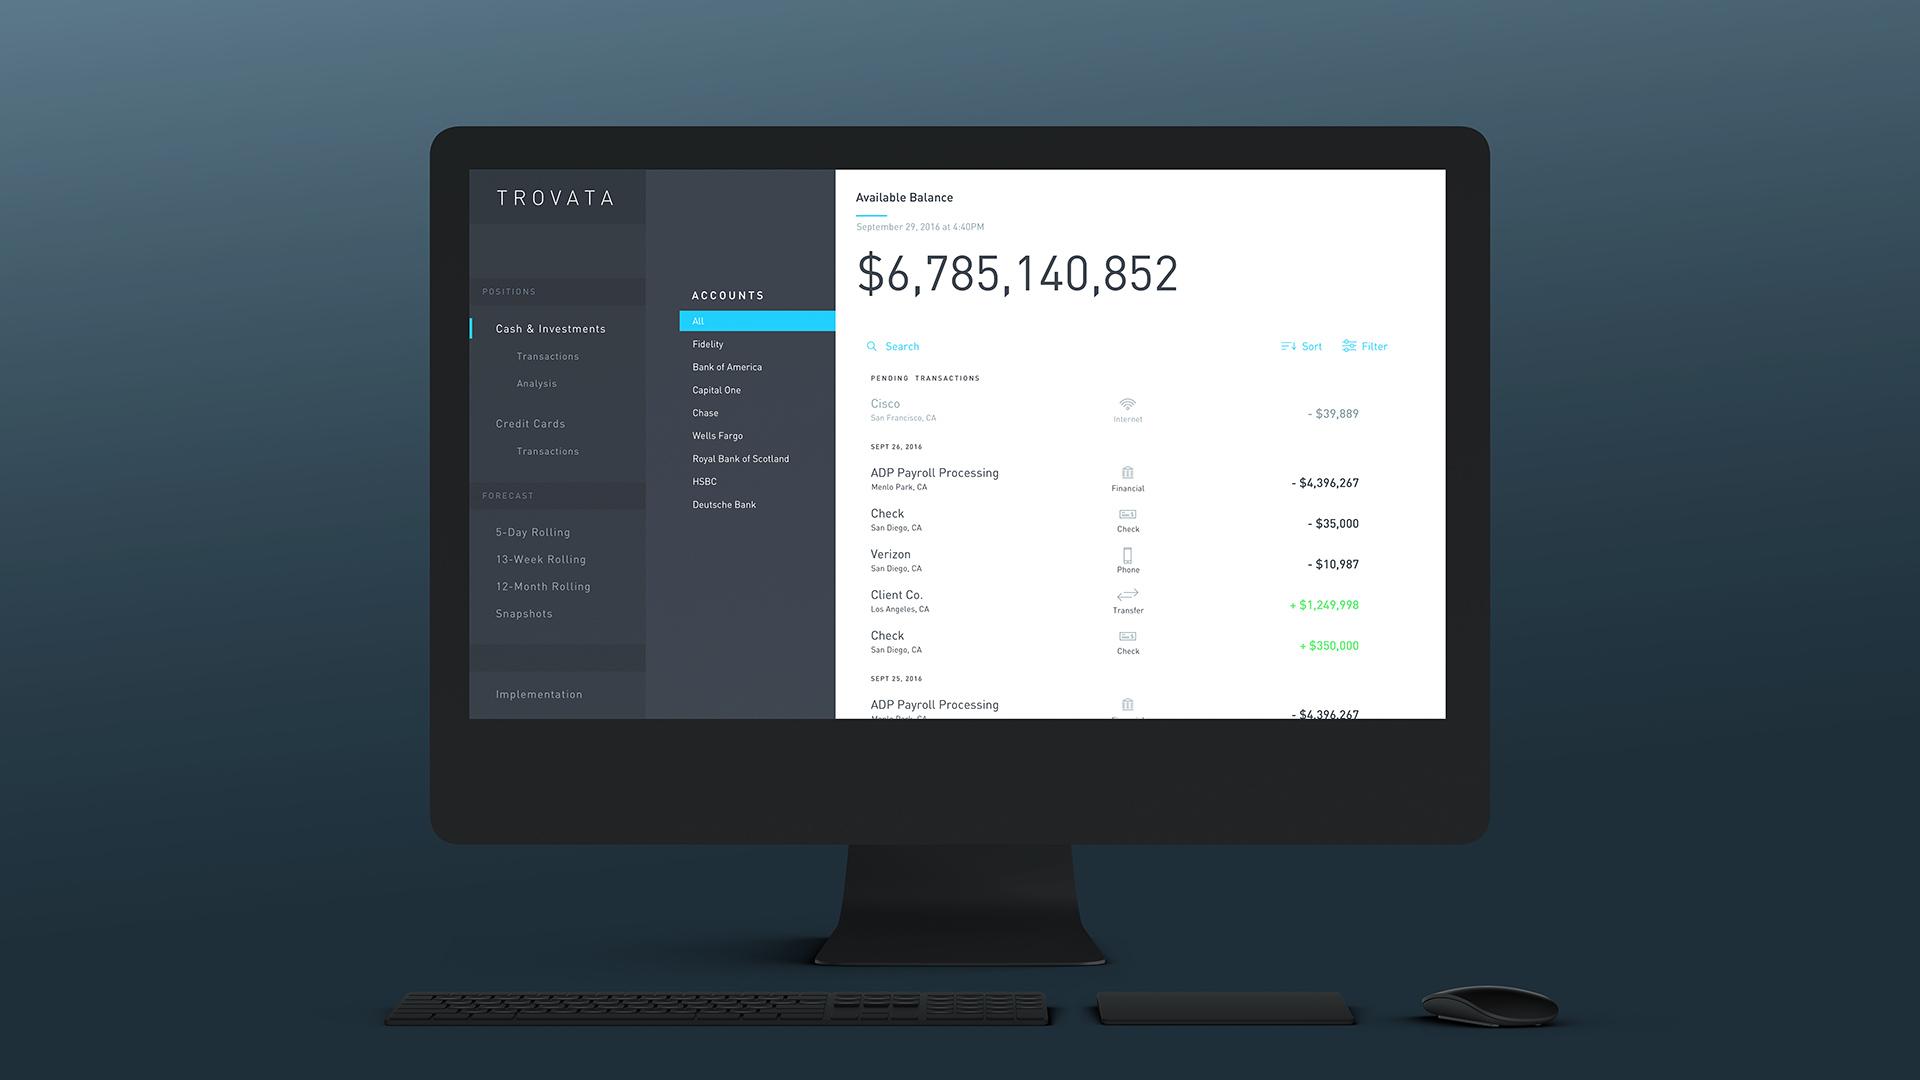 trovata_transactions.jpg